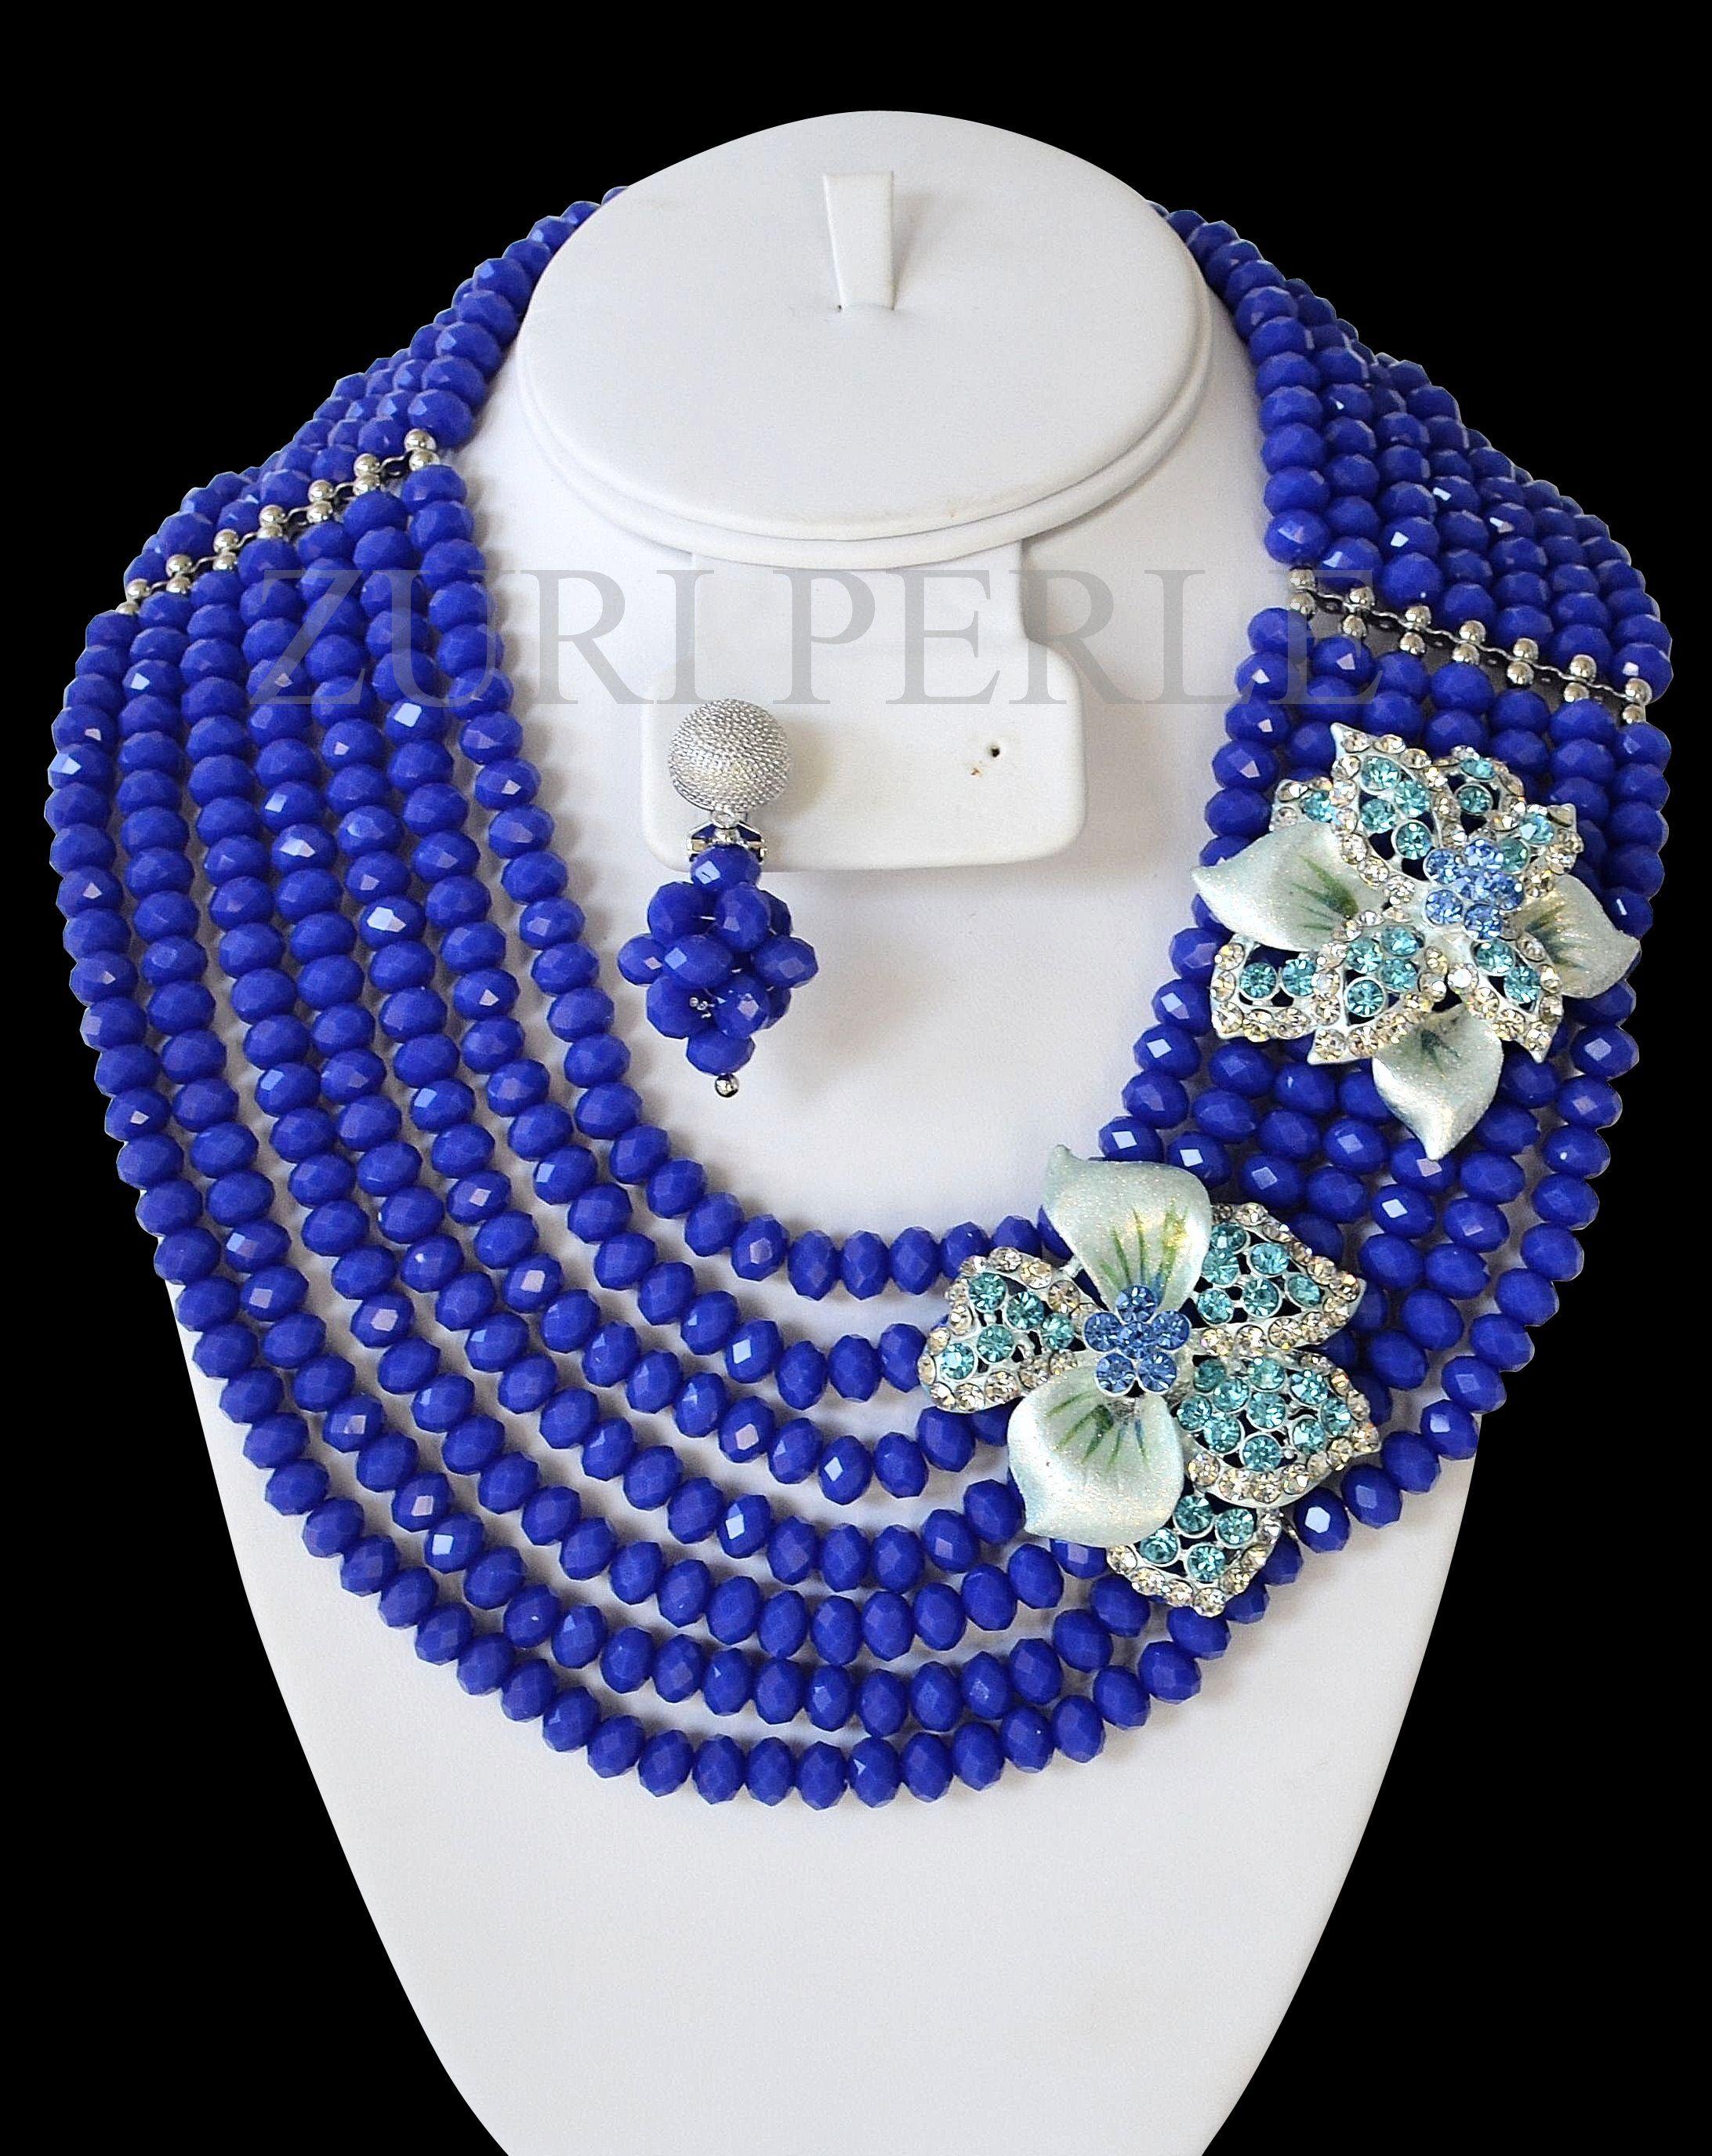 Nigerian wedding traditional jewelry by Zuri Perle Coral Beads ...